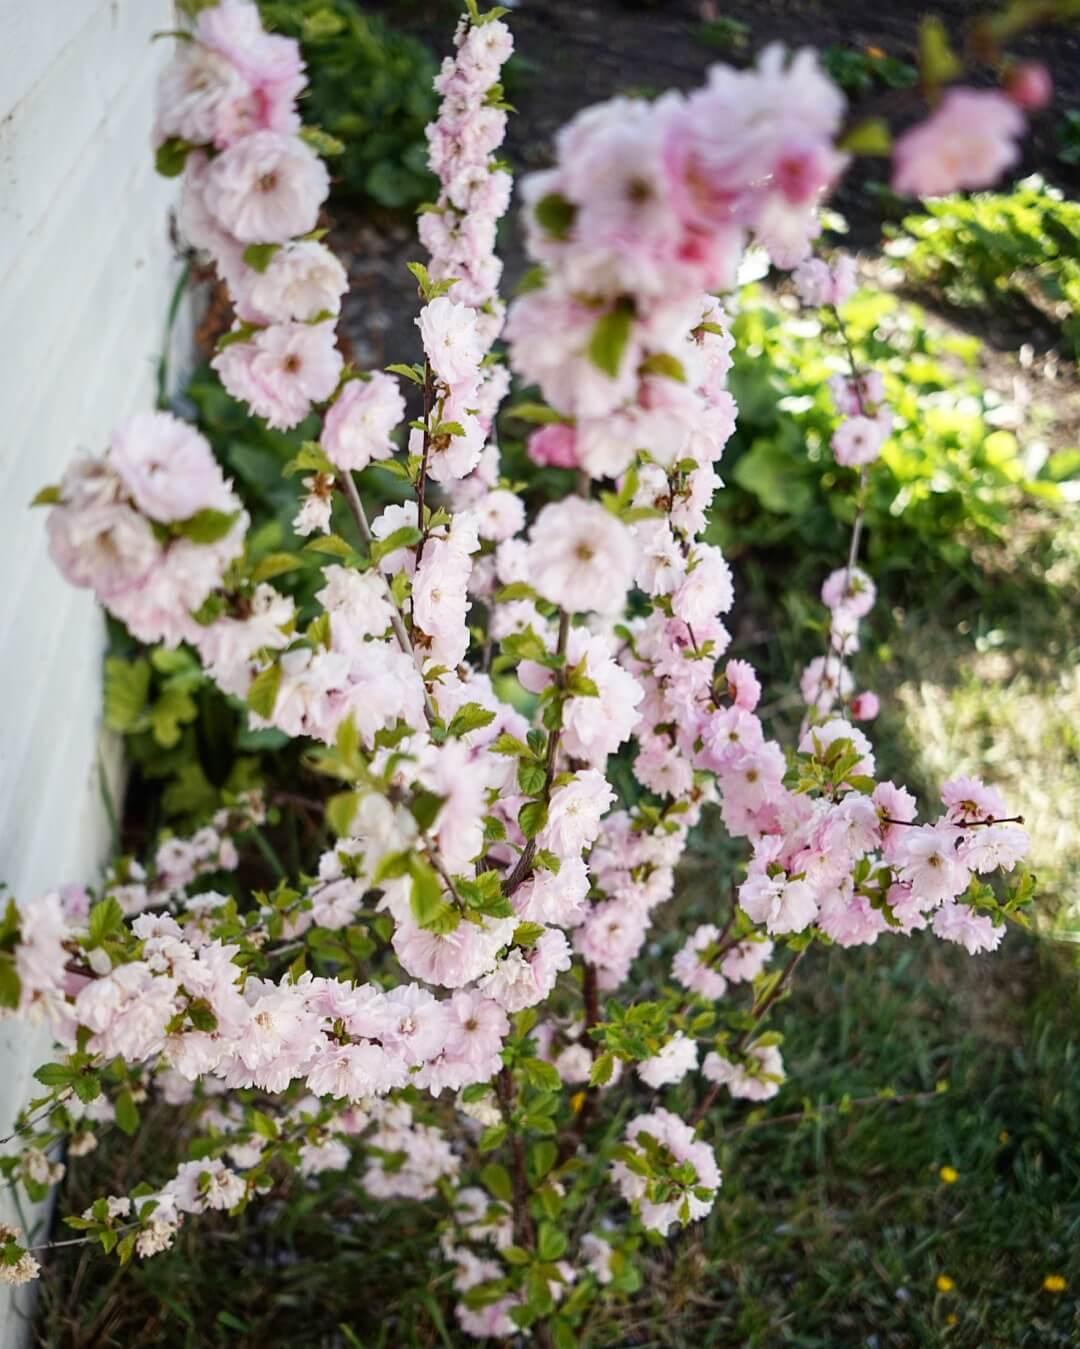 blooming flowers great gardening plants